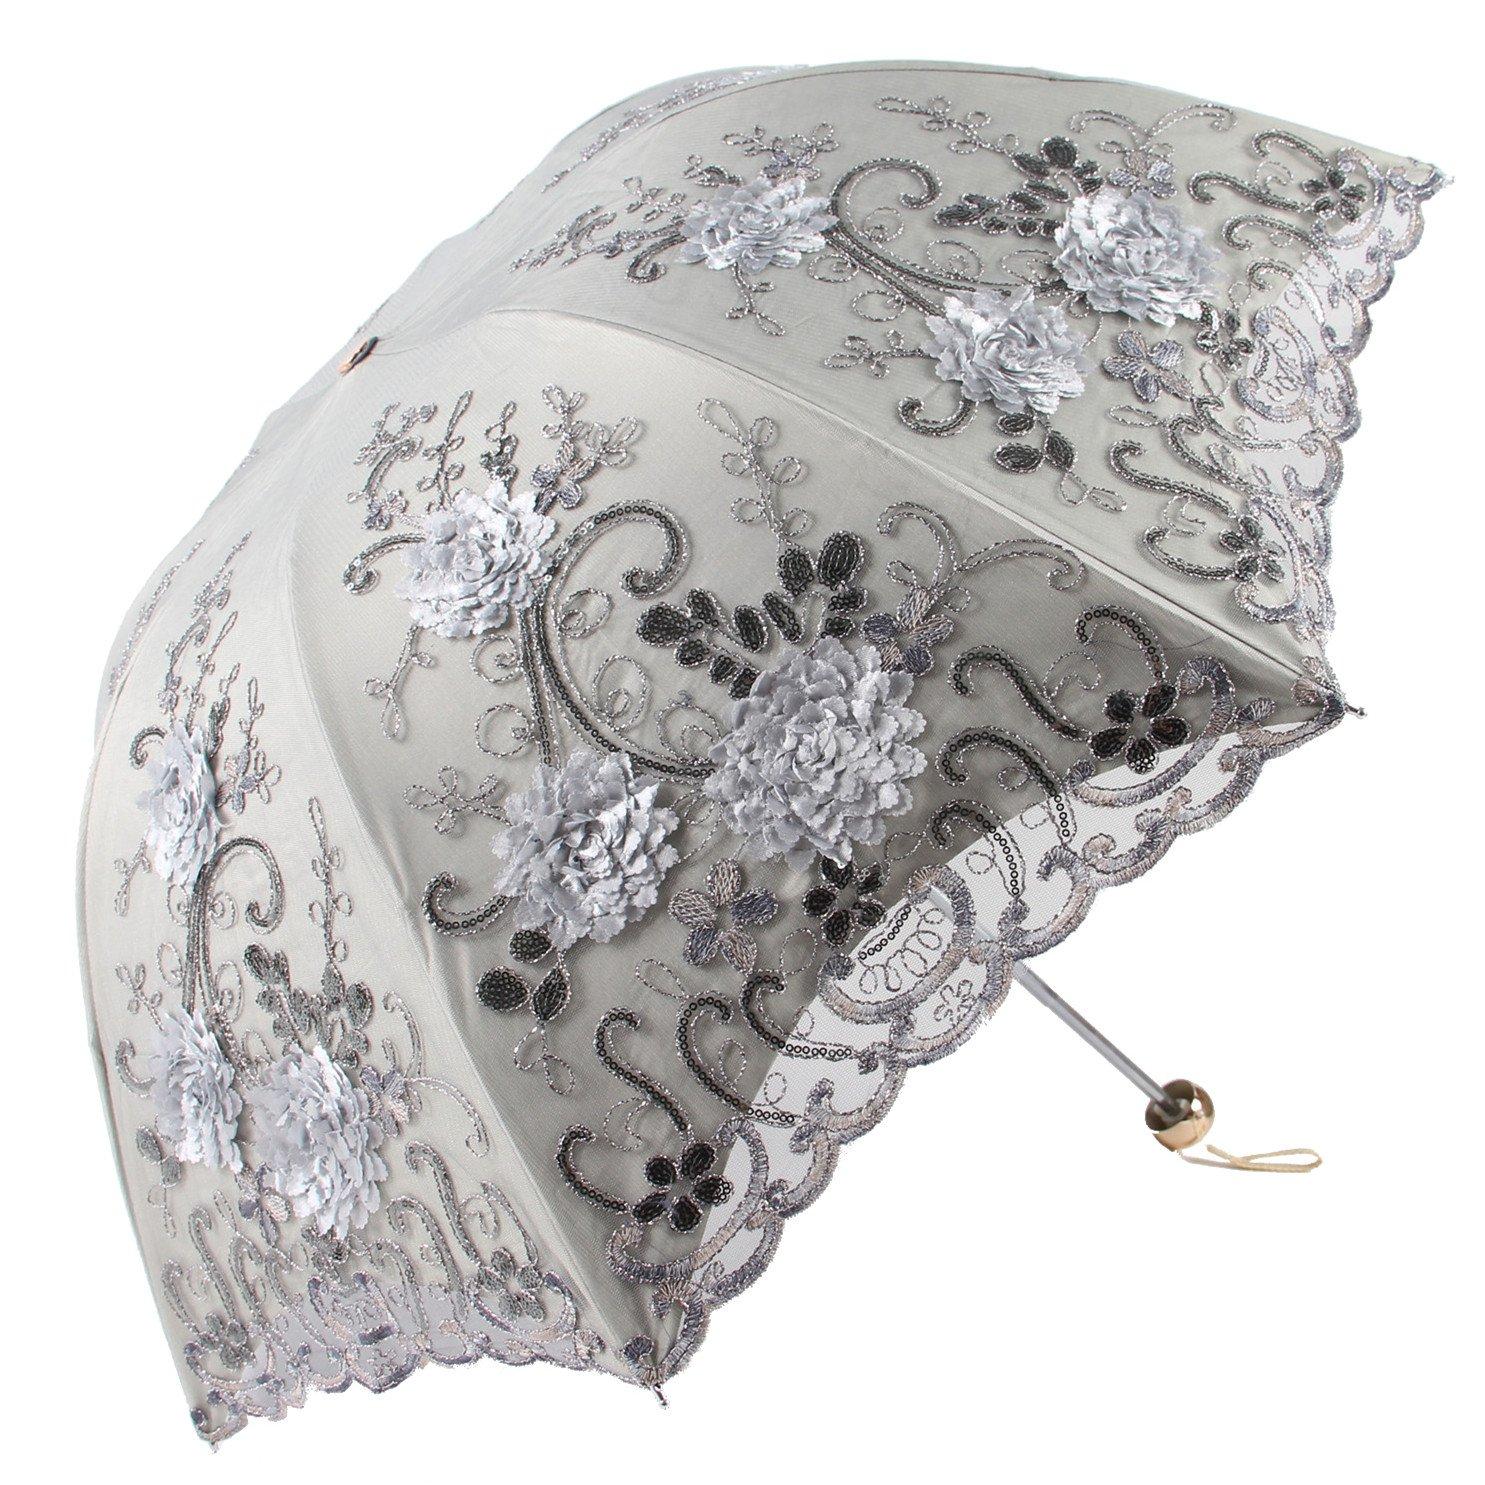 Honeystore Vintage Lace UV Sun Parasol Folding 3D Flower Embroidery Umbrella H1620 Grey by Honeystore